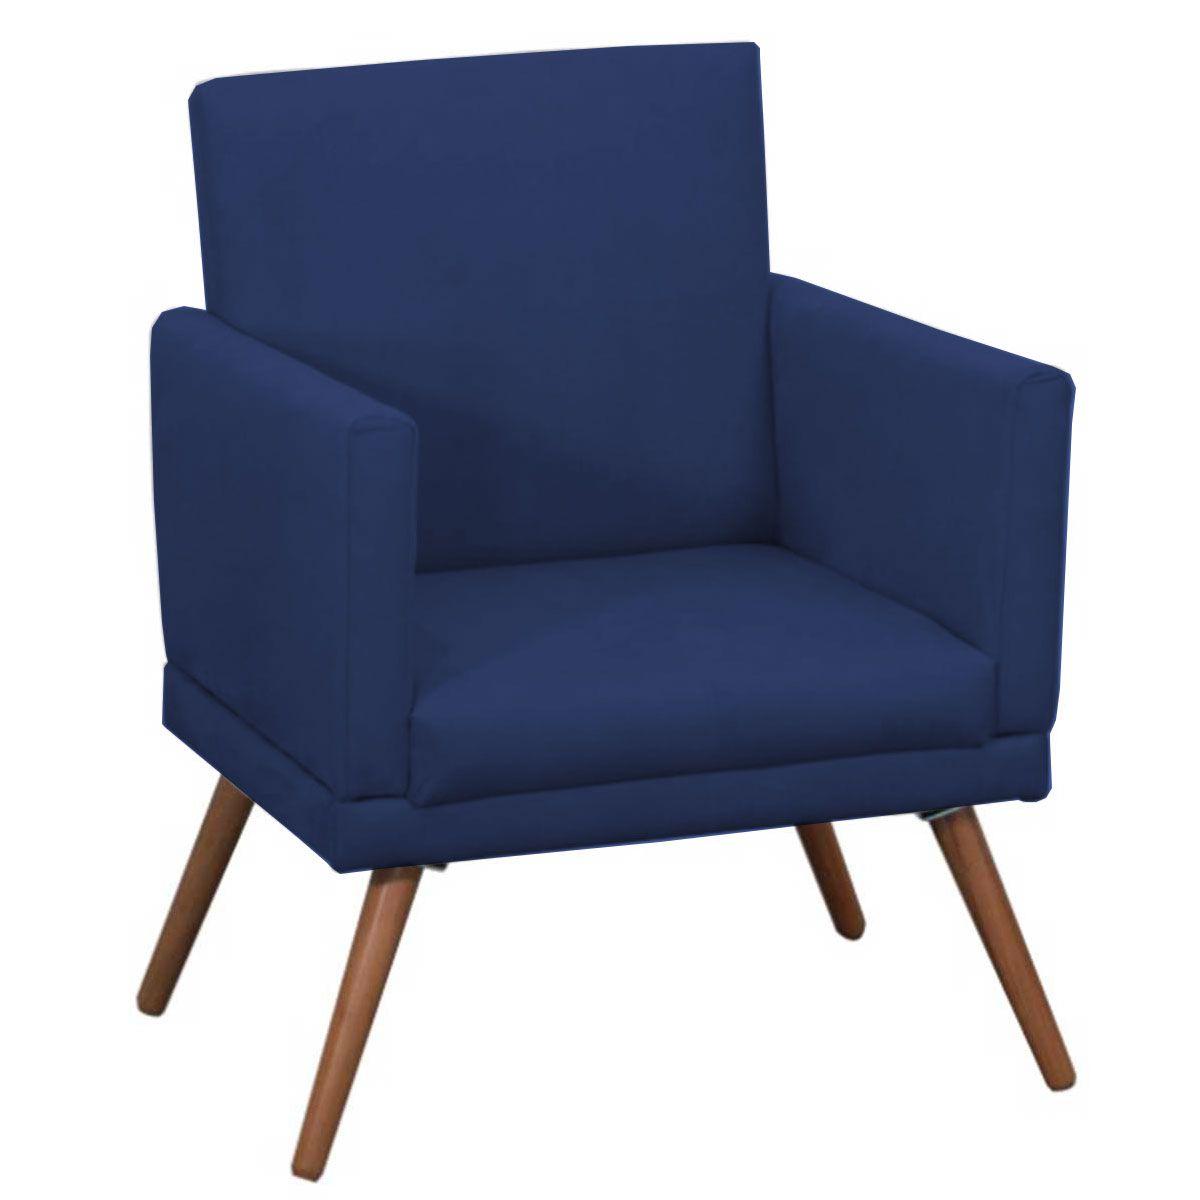 Kit 2 Poltronas Decorativas New Nina Luxo Azul Marinho